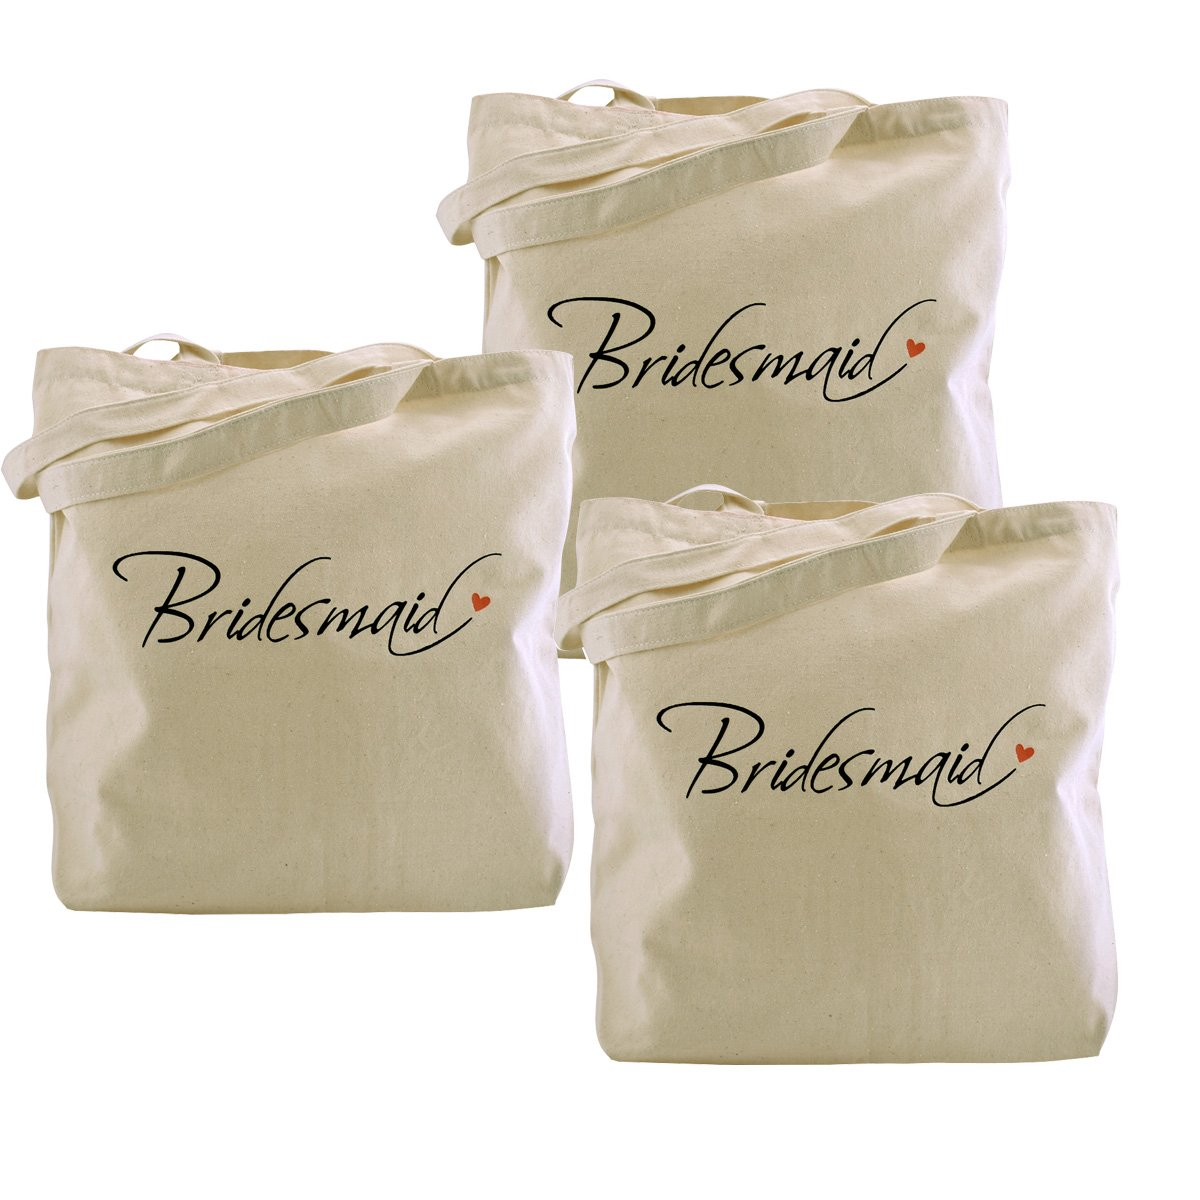 ElegantPark Bridesmaid Tote Bag Wedding Bridesmaid Gifts 100% Cotton 3 Pcs